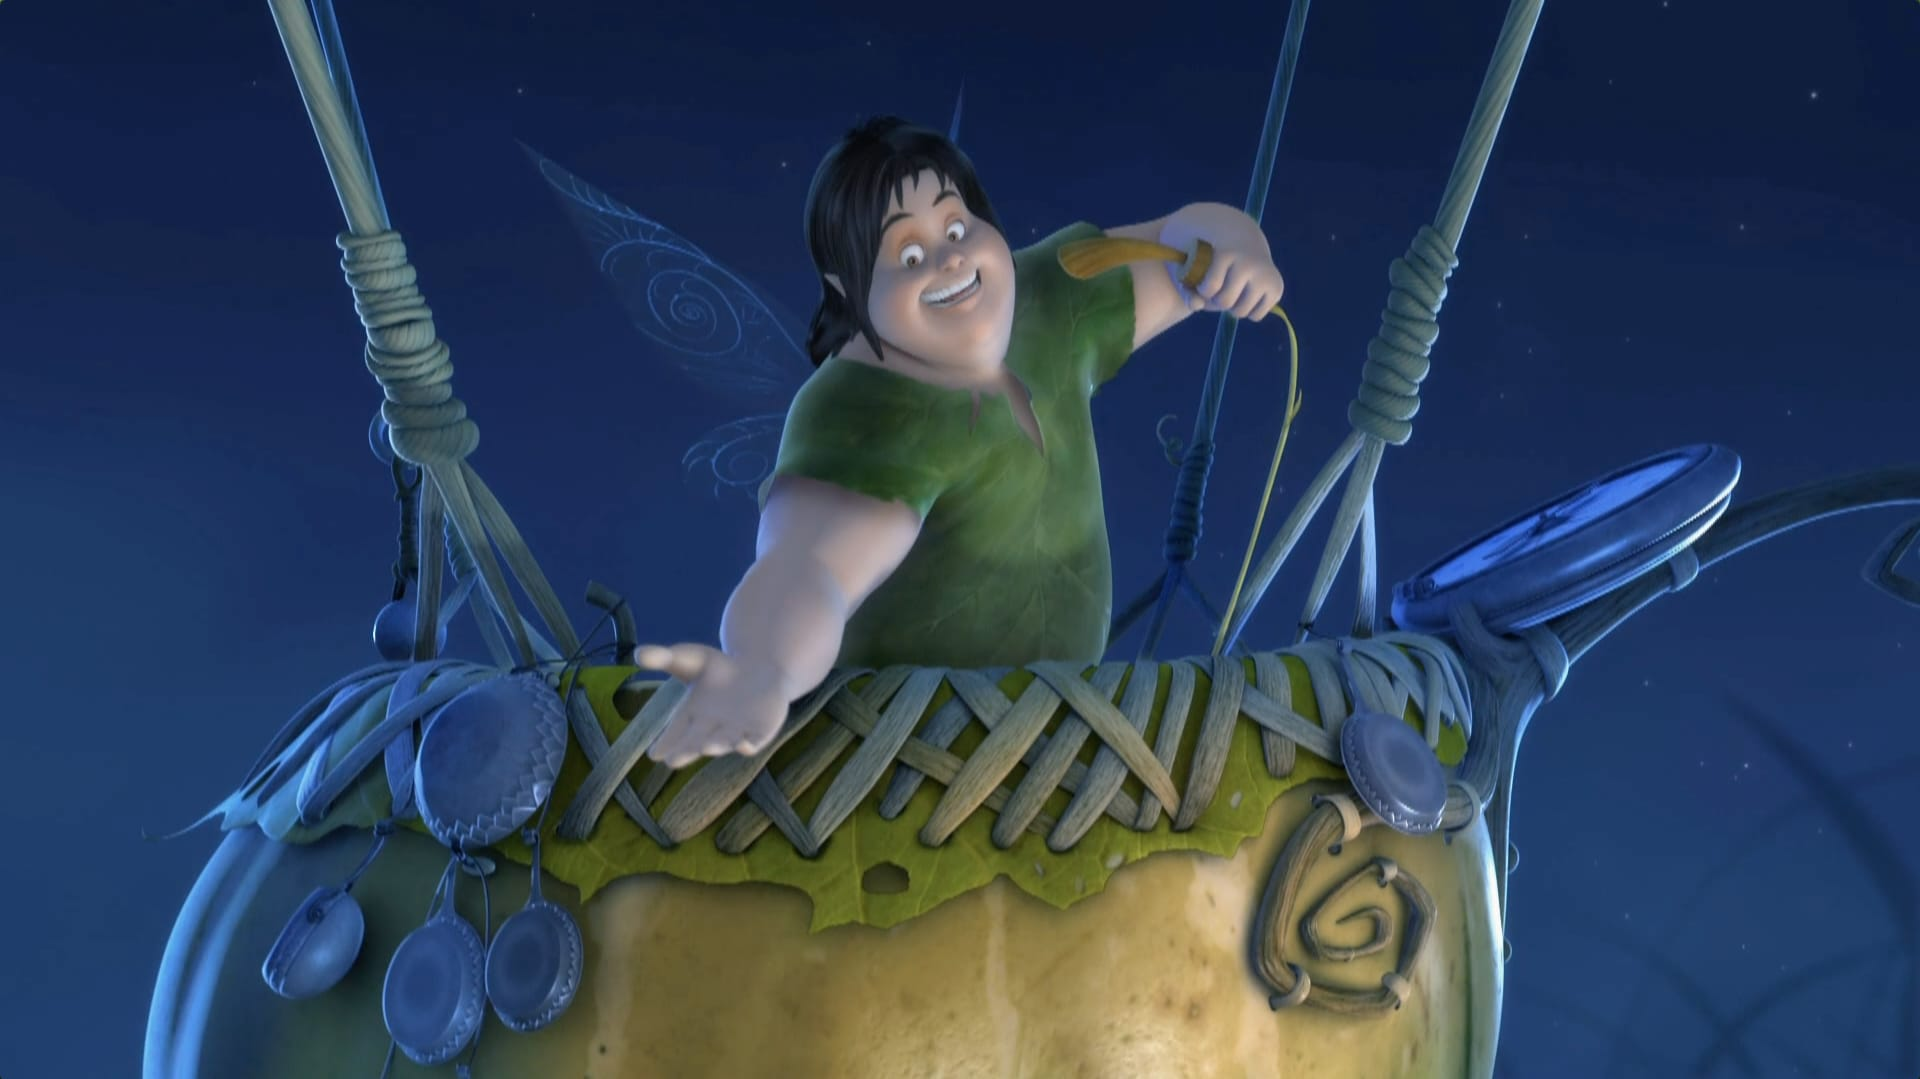 Repostería de Hadas - Disney Hadas